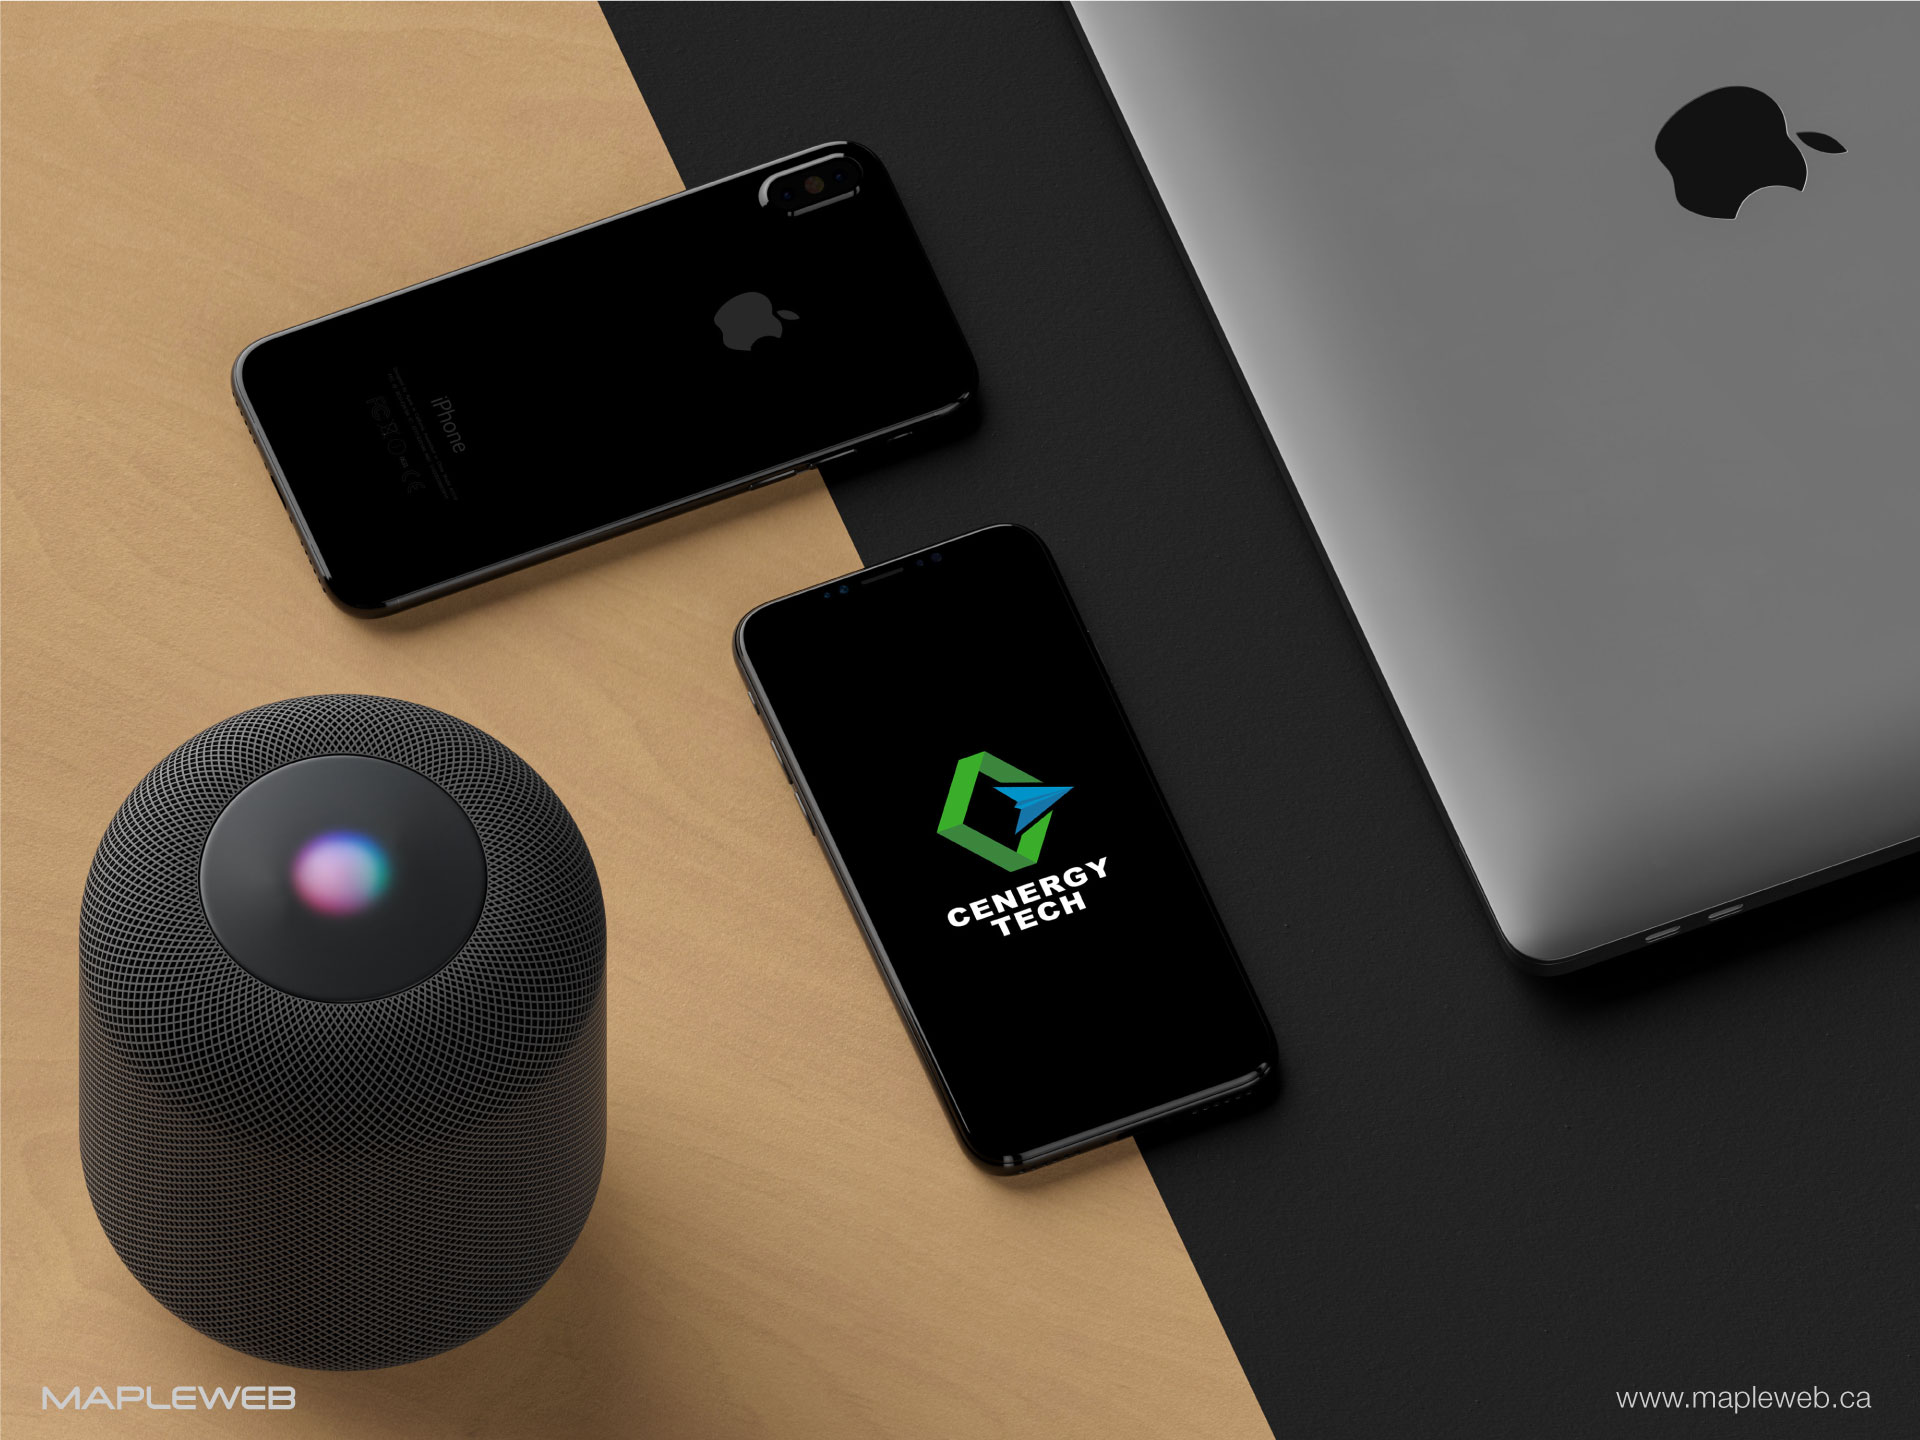 cenergy-tech-brand-logo-design-by-mapleweb-vancouver-canada-laptop-iphone-siri-mock